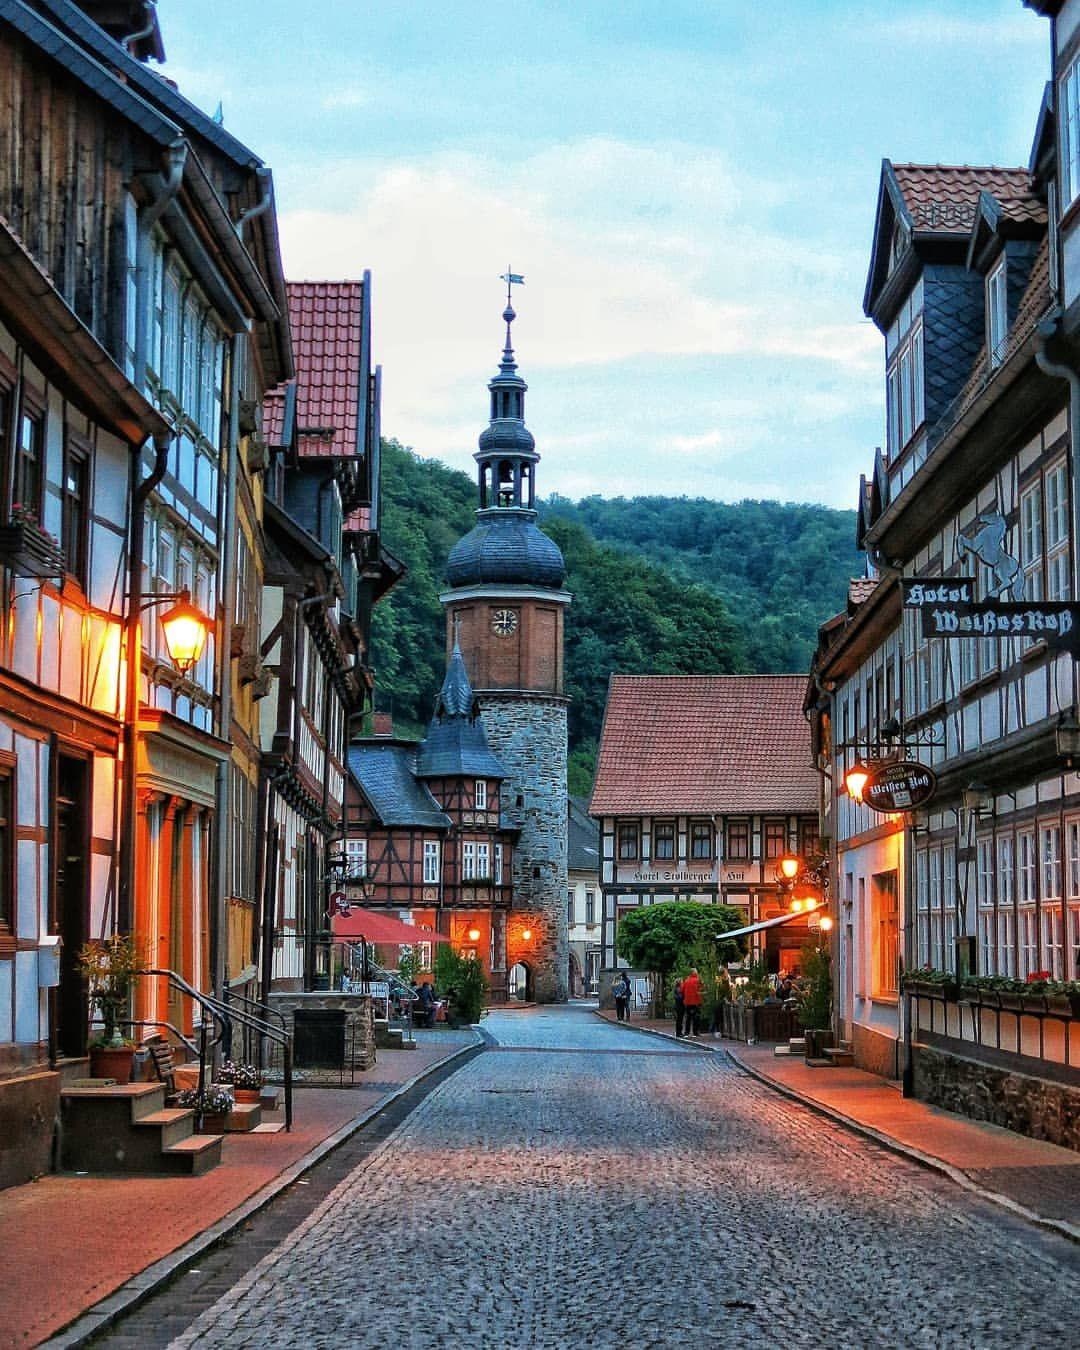 Stolberg Harz Germany Europe Travelgram Travel Drops Ig Europa Citybestpics Germanvision Loves United Germany D Germany Europe Travel Dreams Germany